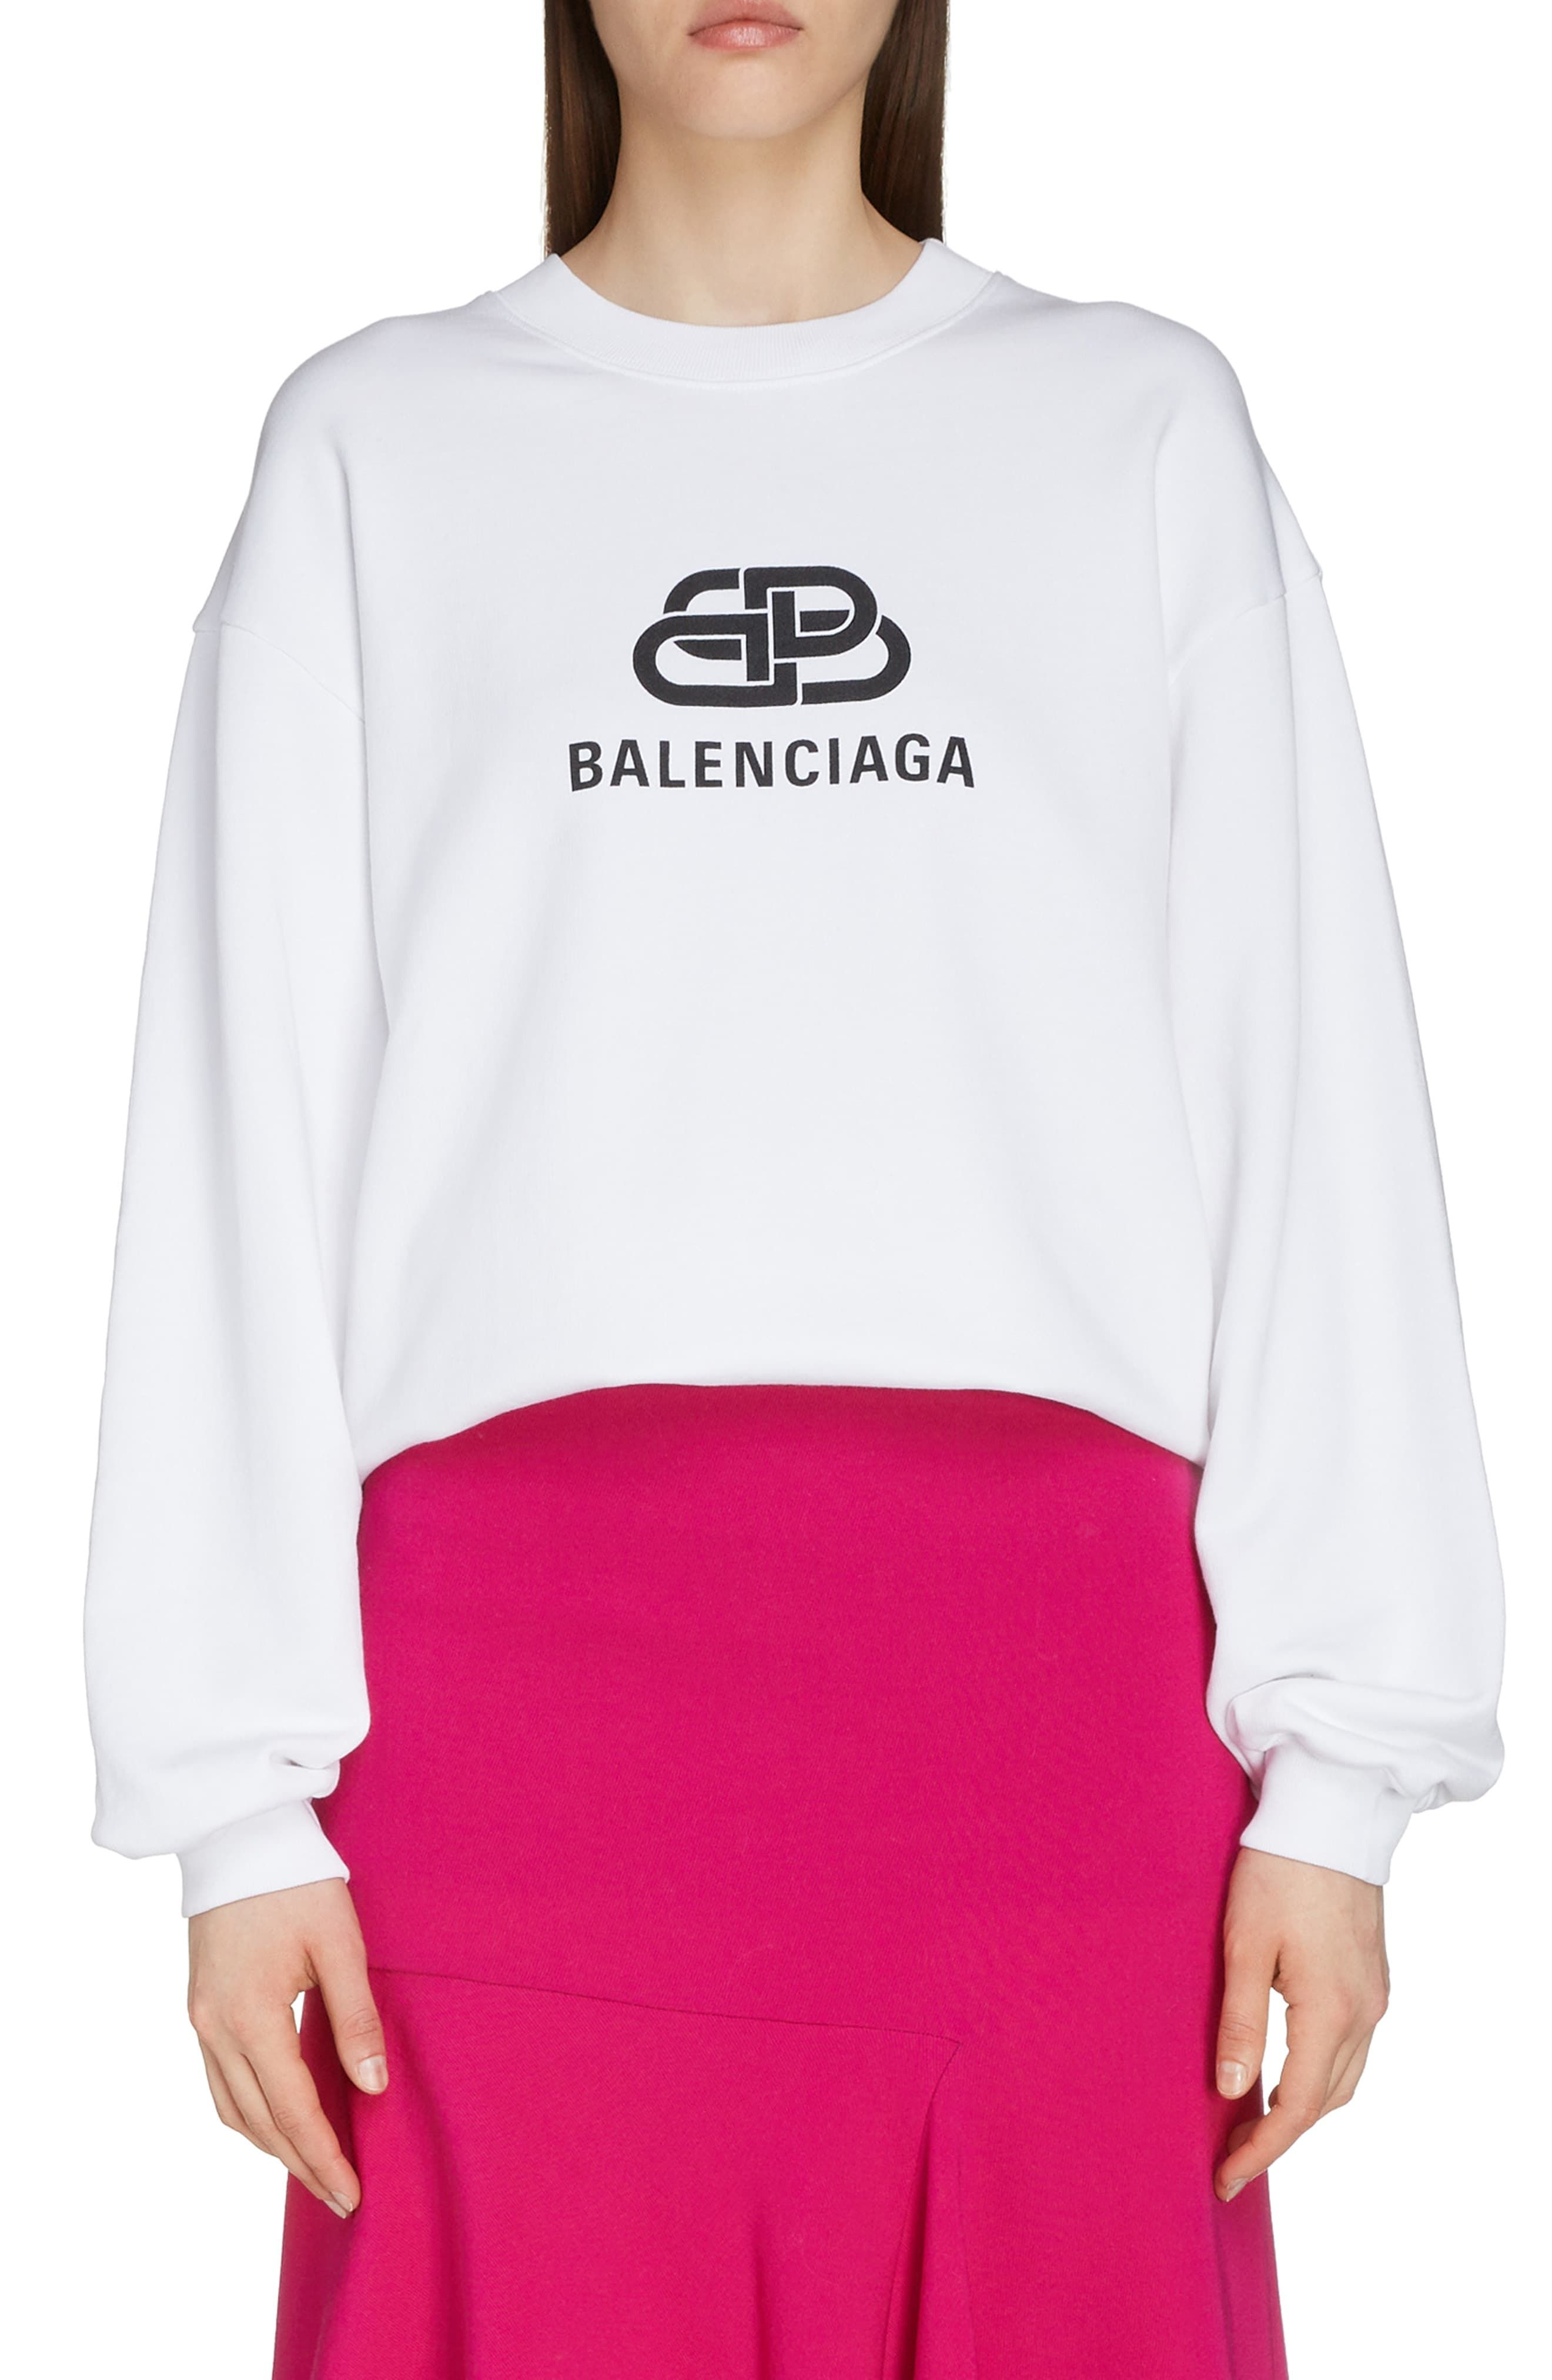 Balenciaga Interlocking Bb Logo Sweatshirt Nordstrom Sweatshirt Fashion Fashion Clothes Women Long Sleeve Tshirt Men [ 4048 x 2640 Pixel ]